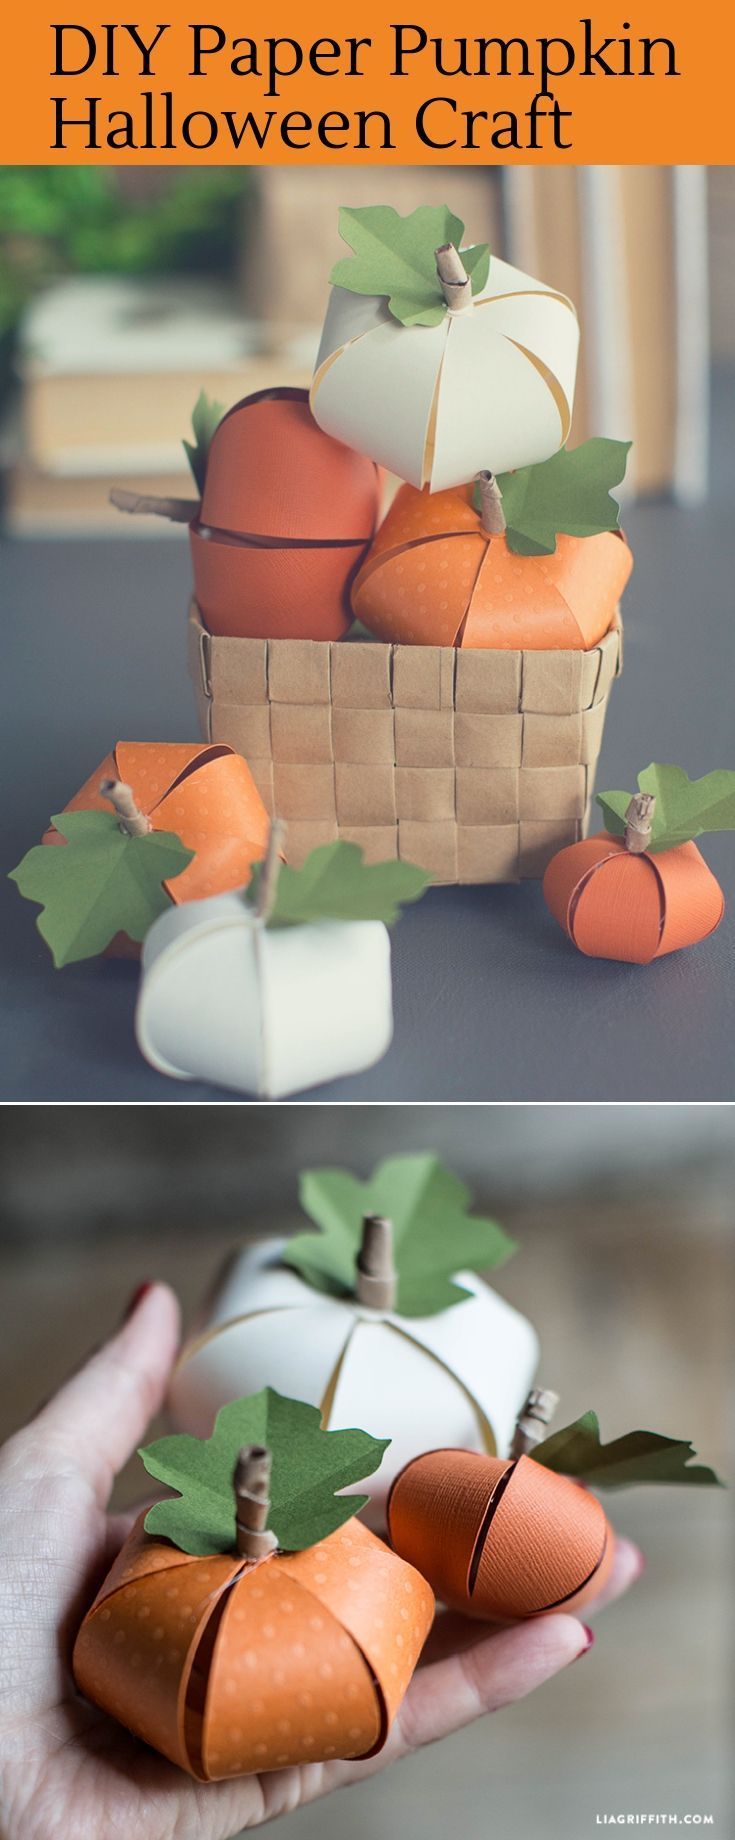 15+ DIY Halloween Pumpkin Decorations from Different